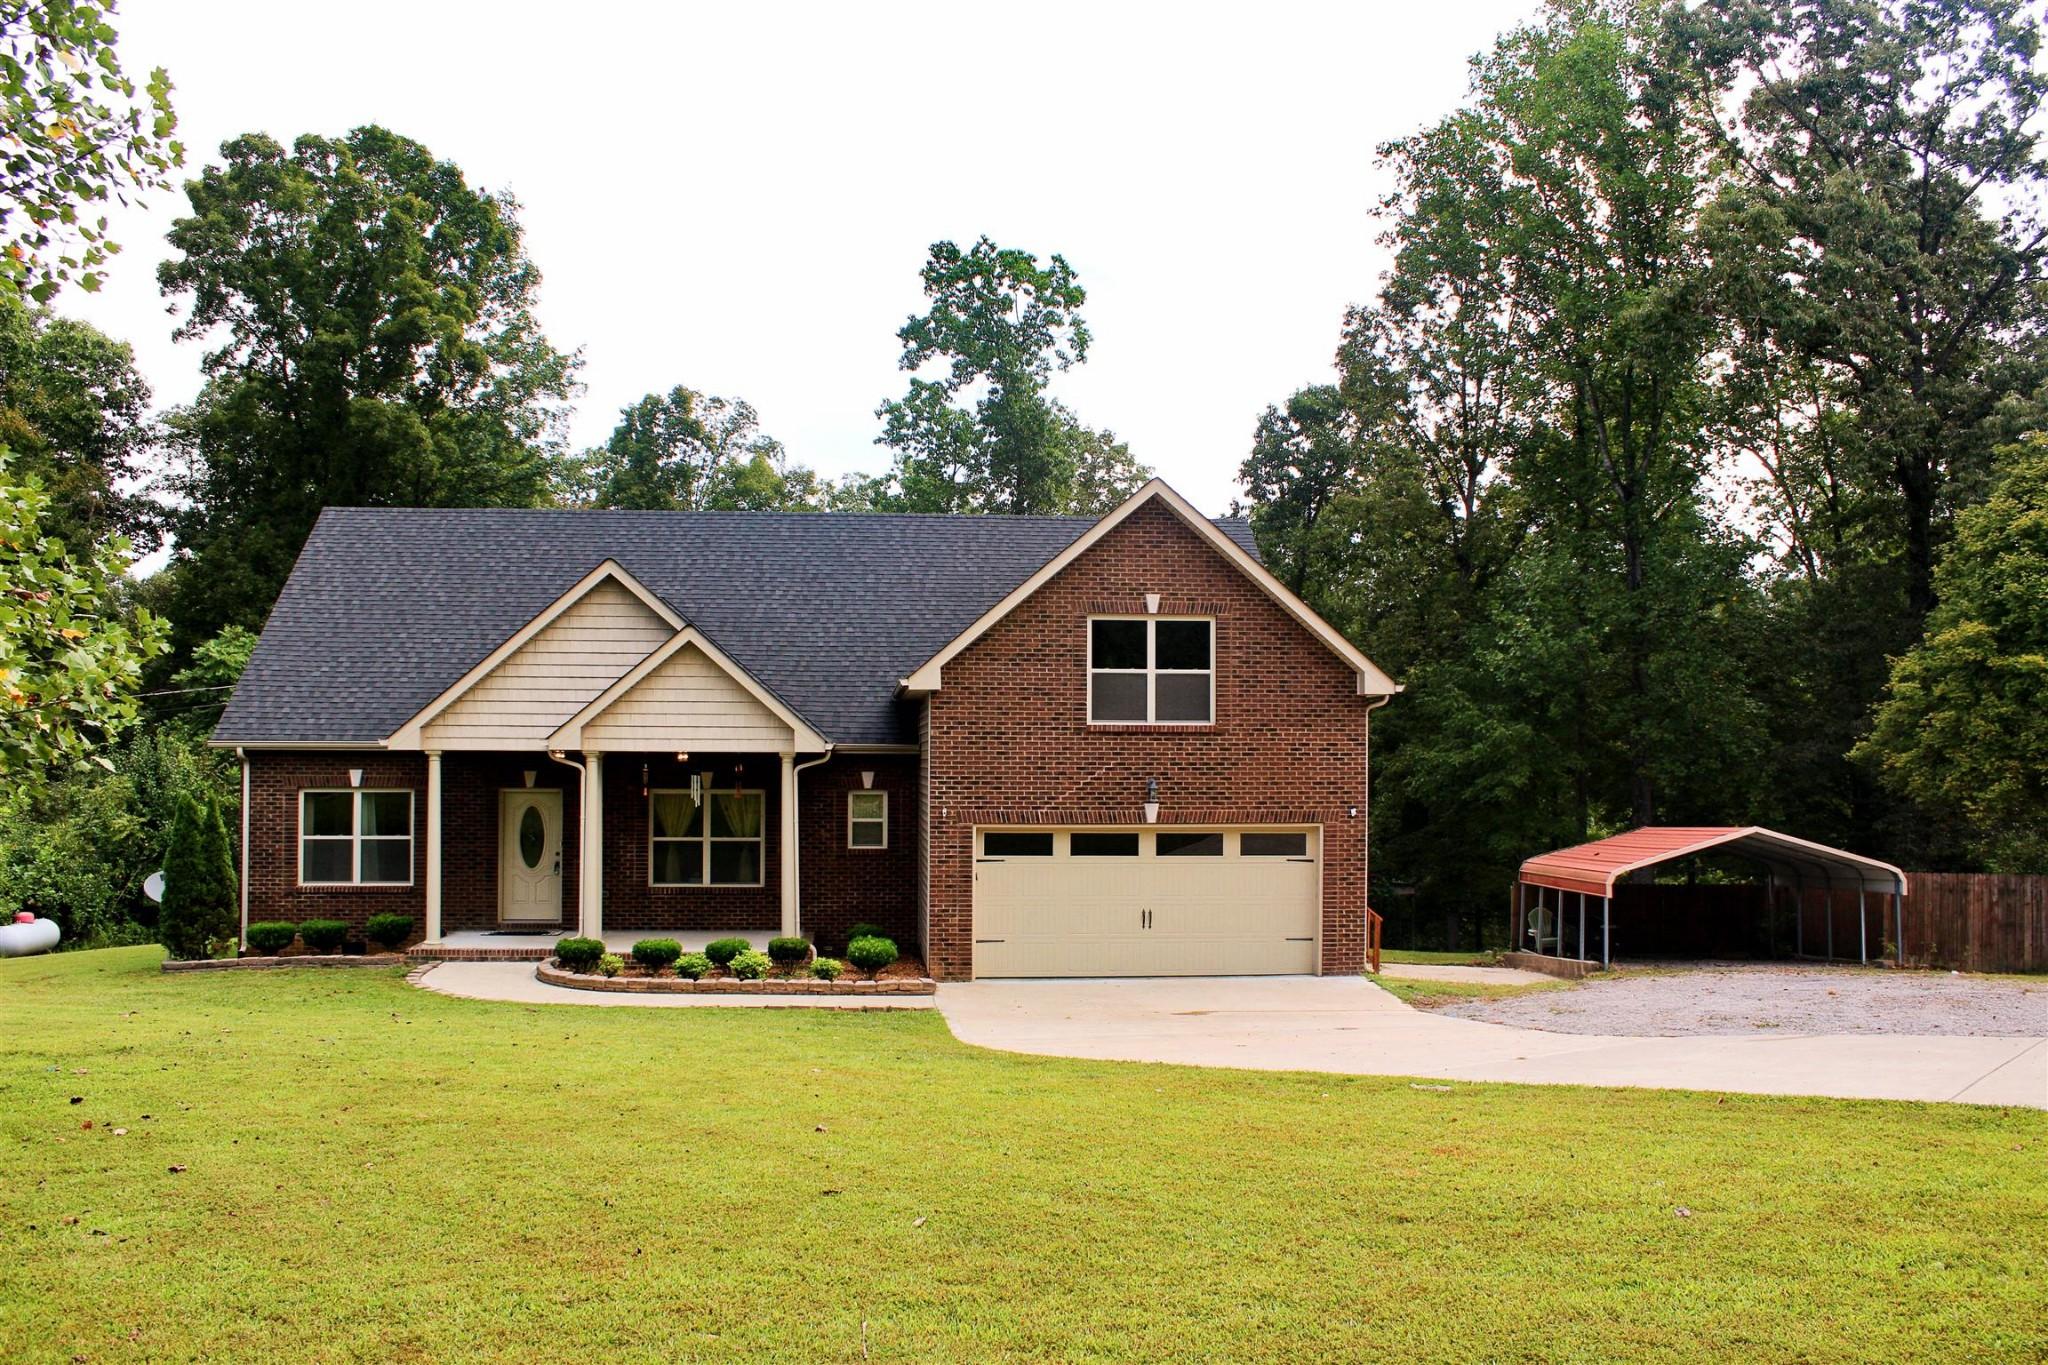 2565 Farms Cir Property Photo - Woodlawn, TN real estate listing